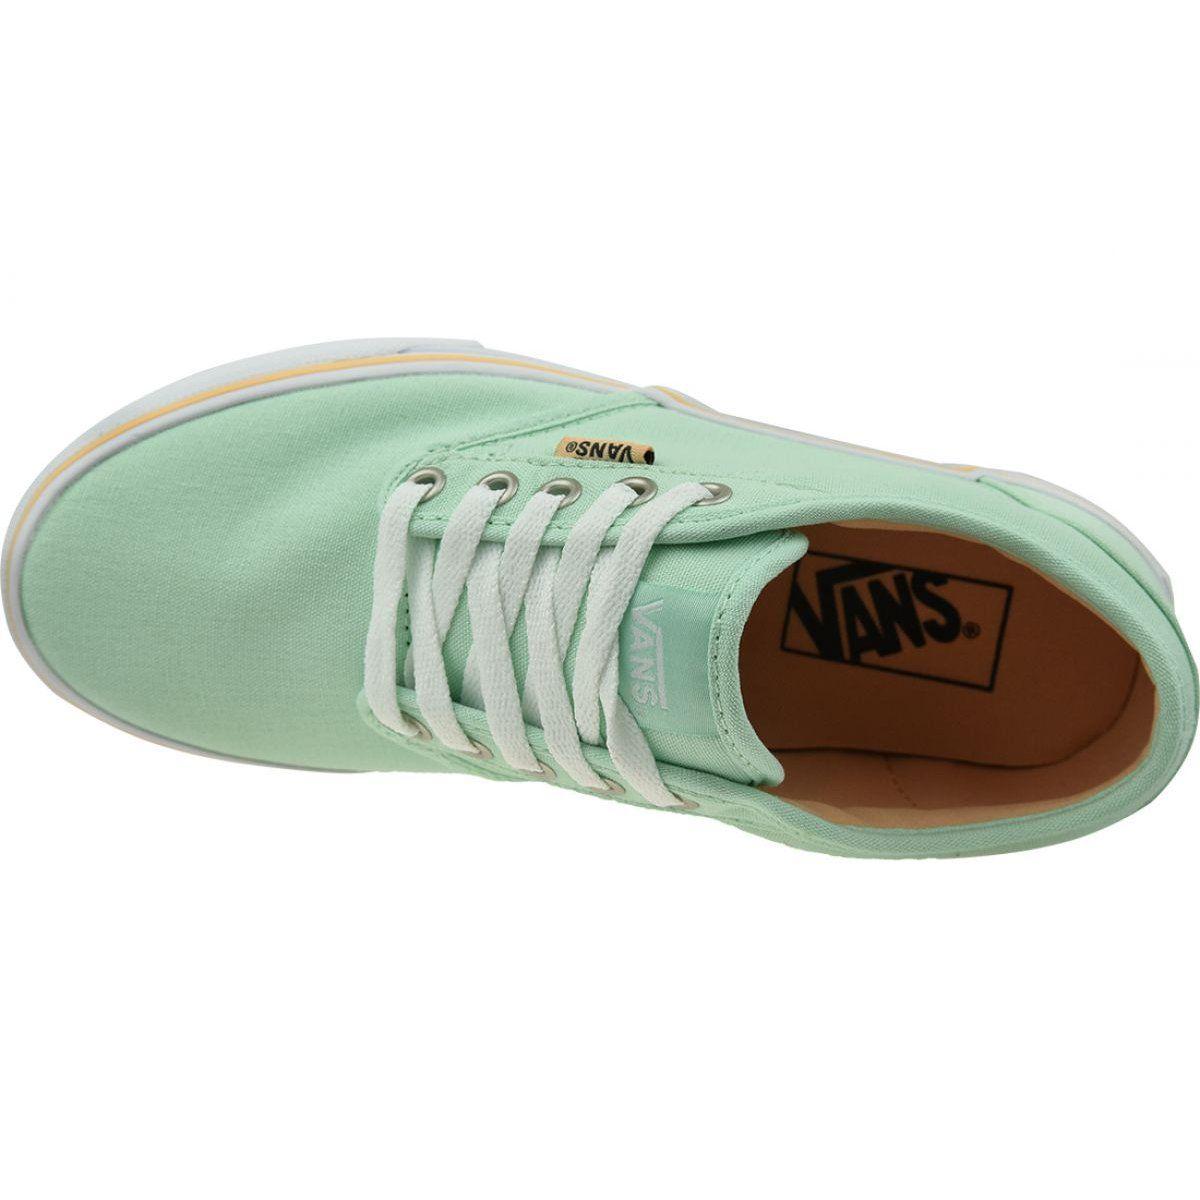 Vans Atwood Bay W Va348xmy3 Green Vans Womens Sneakers Shoe Inserts